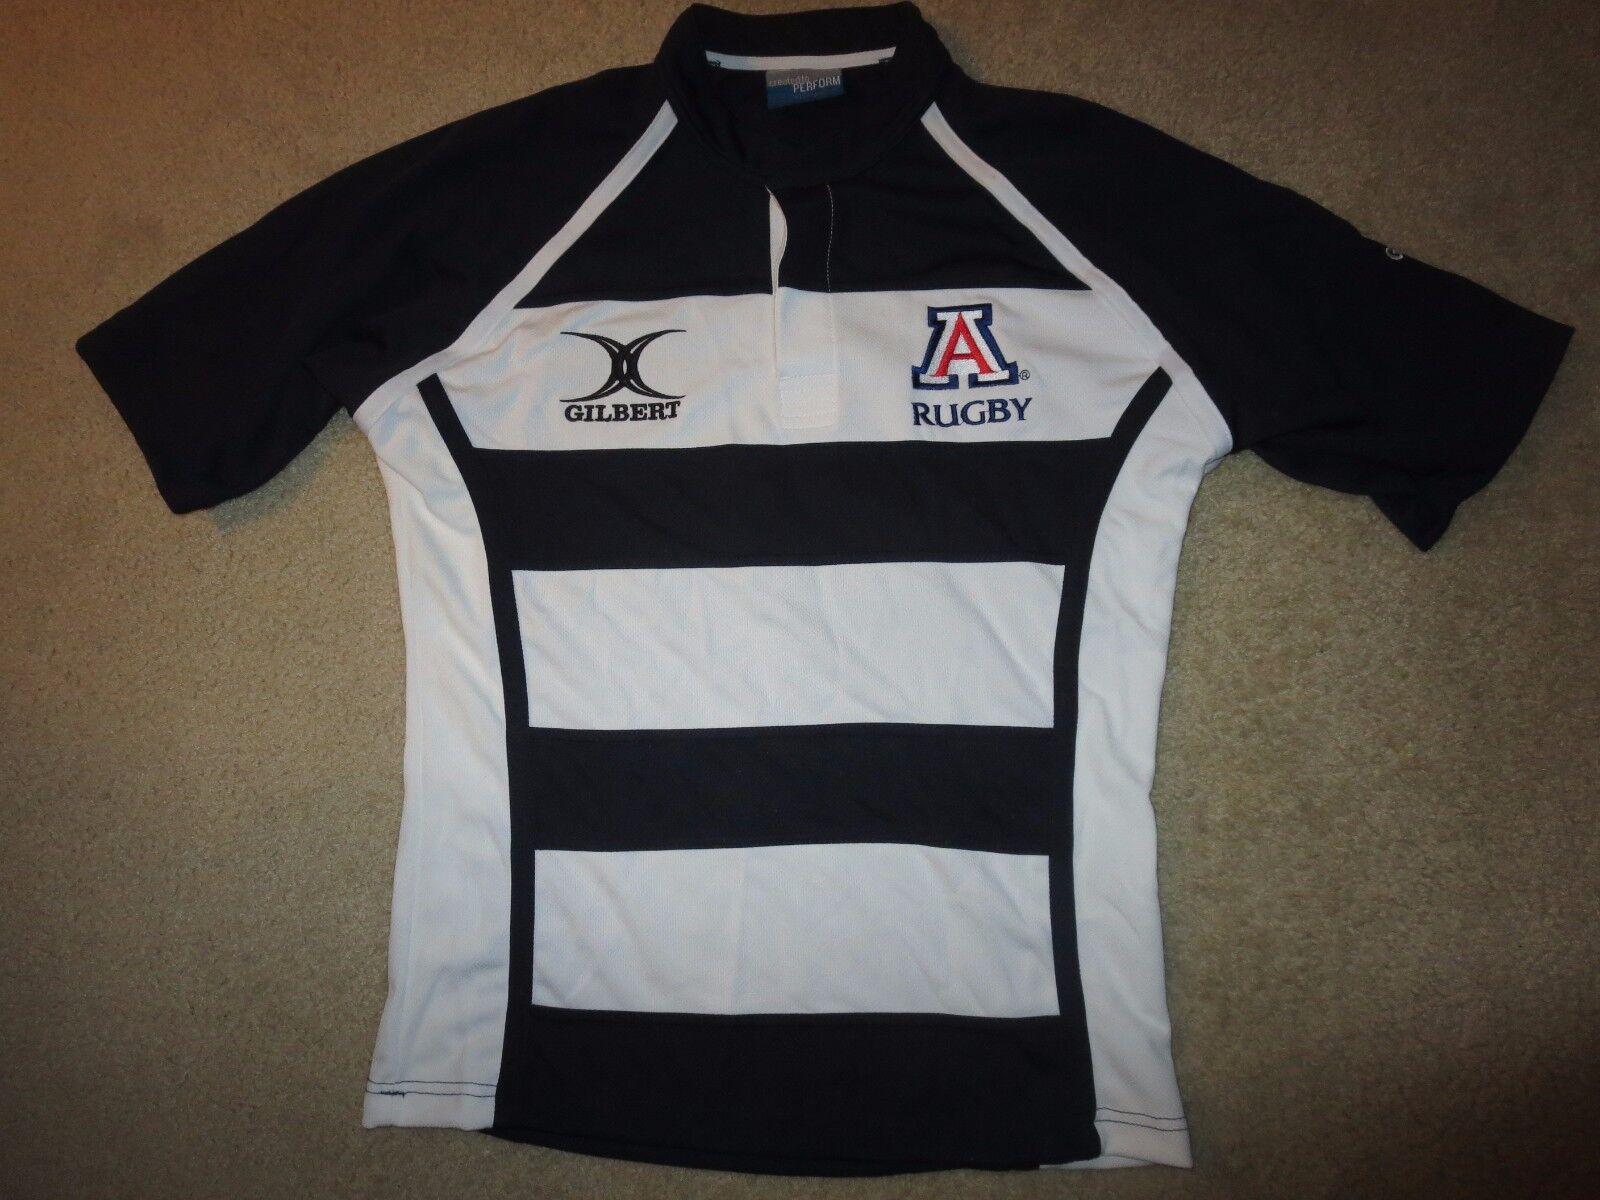 Arizona wildcats rugby team  12 pac 12 game worn Gilbert shirt lg long